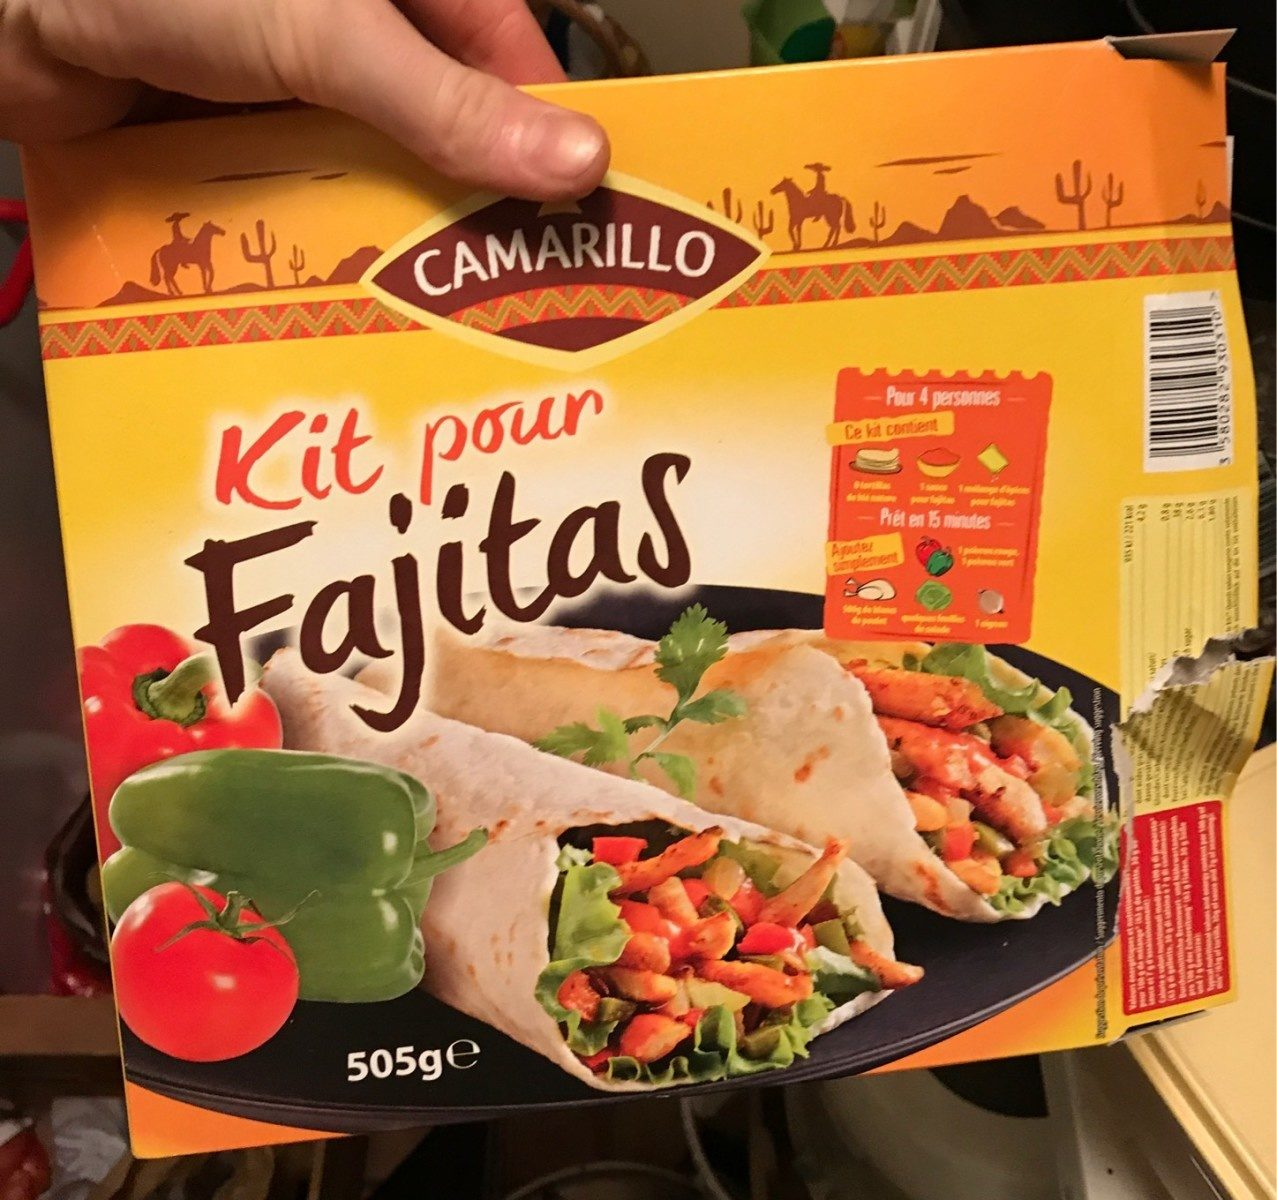 Kit pour faritas - Produit - fr